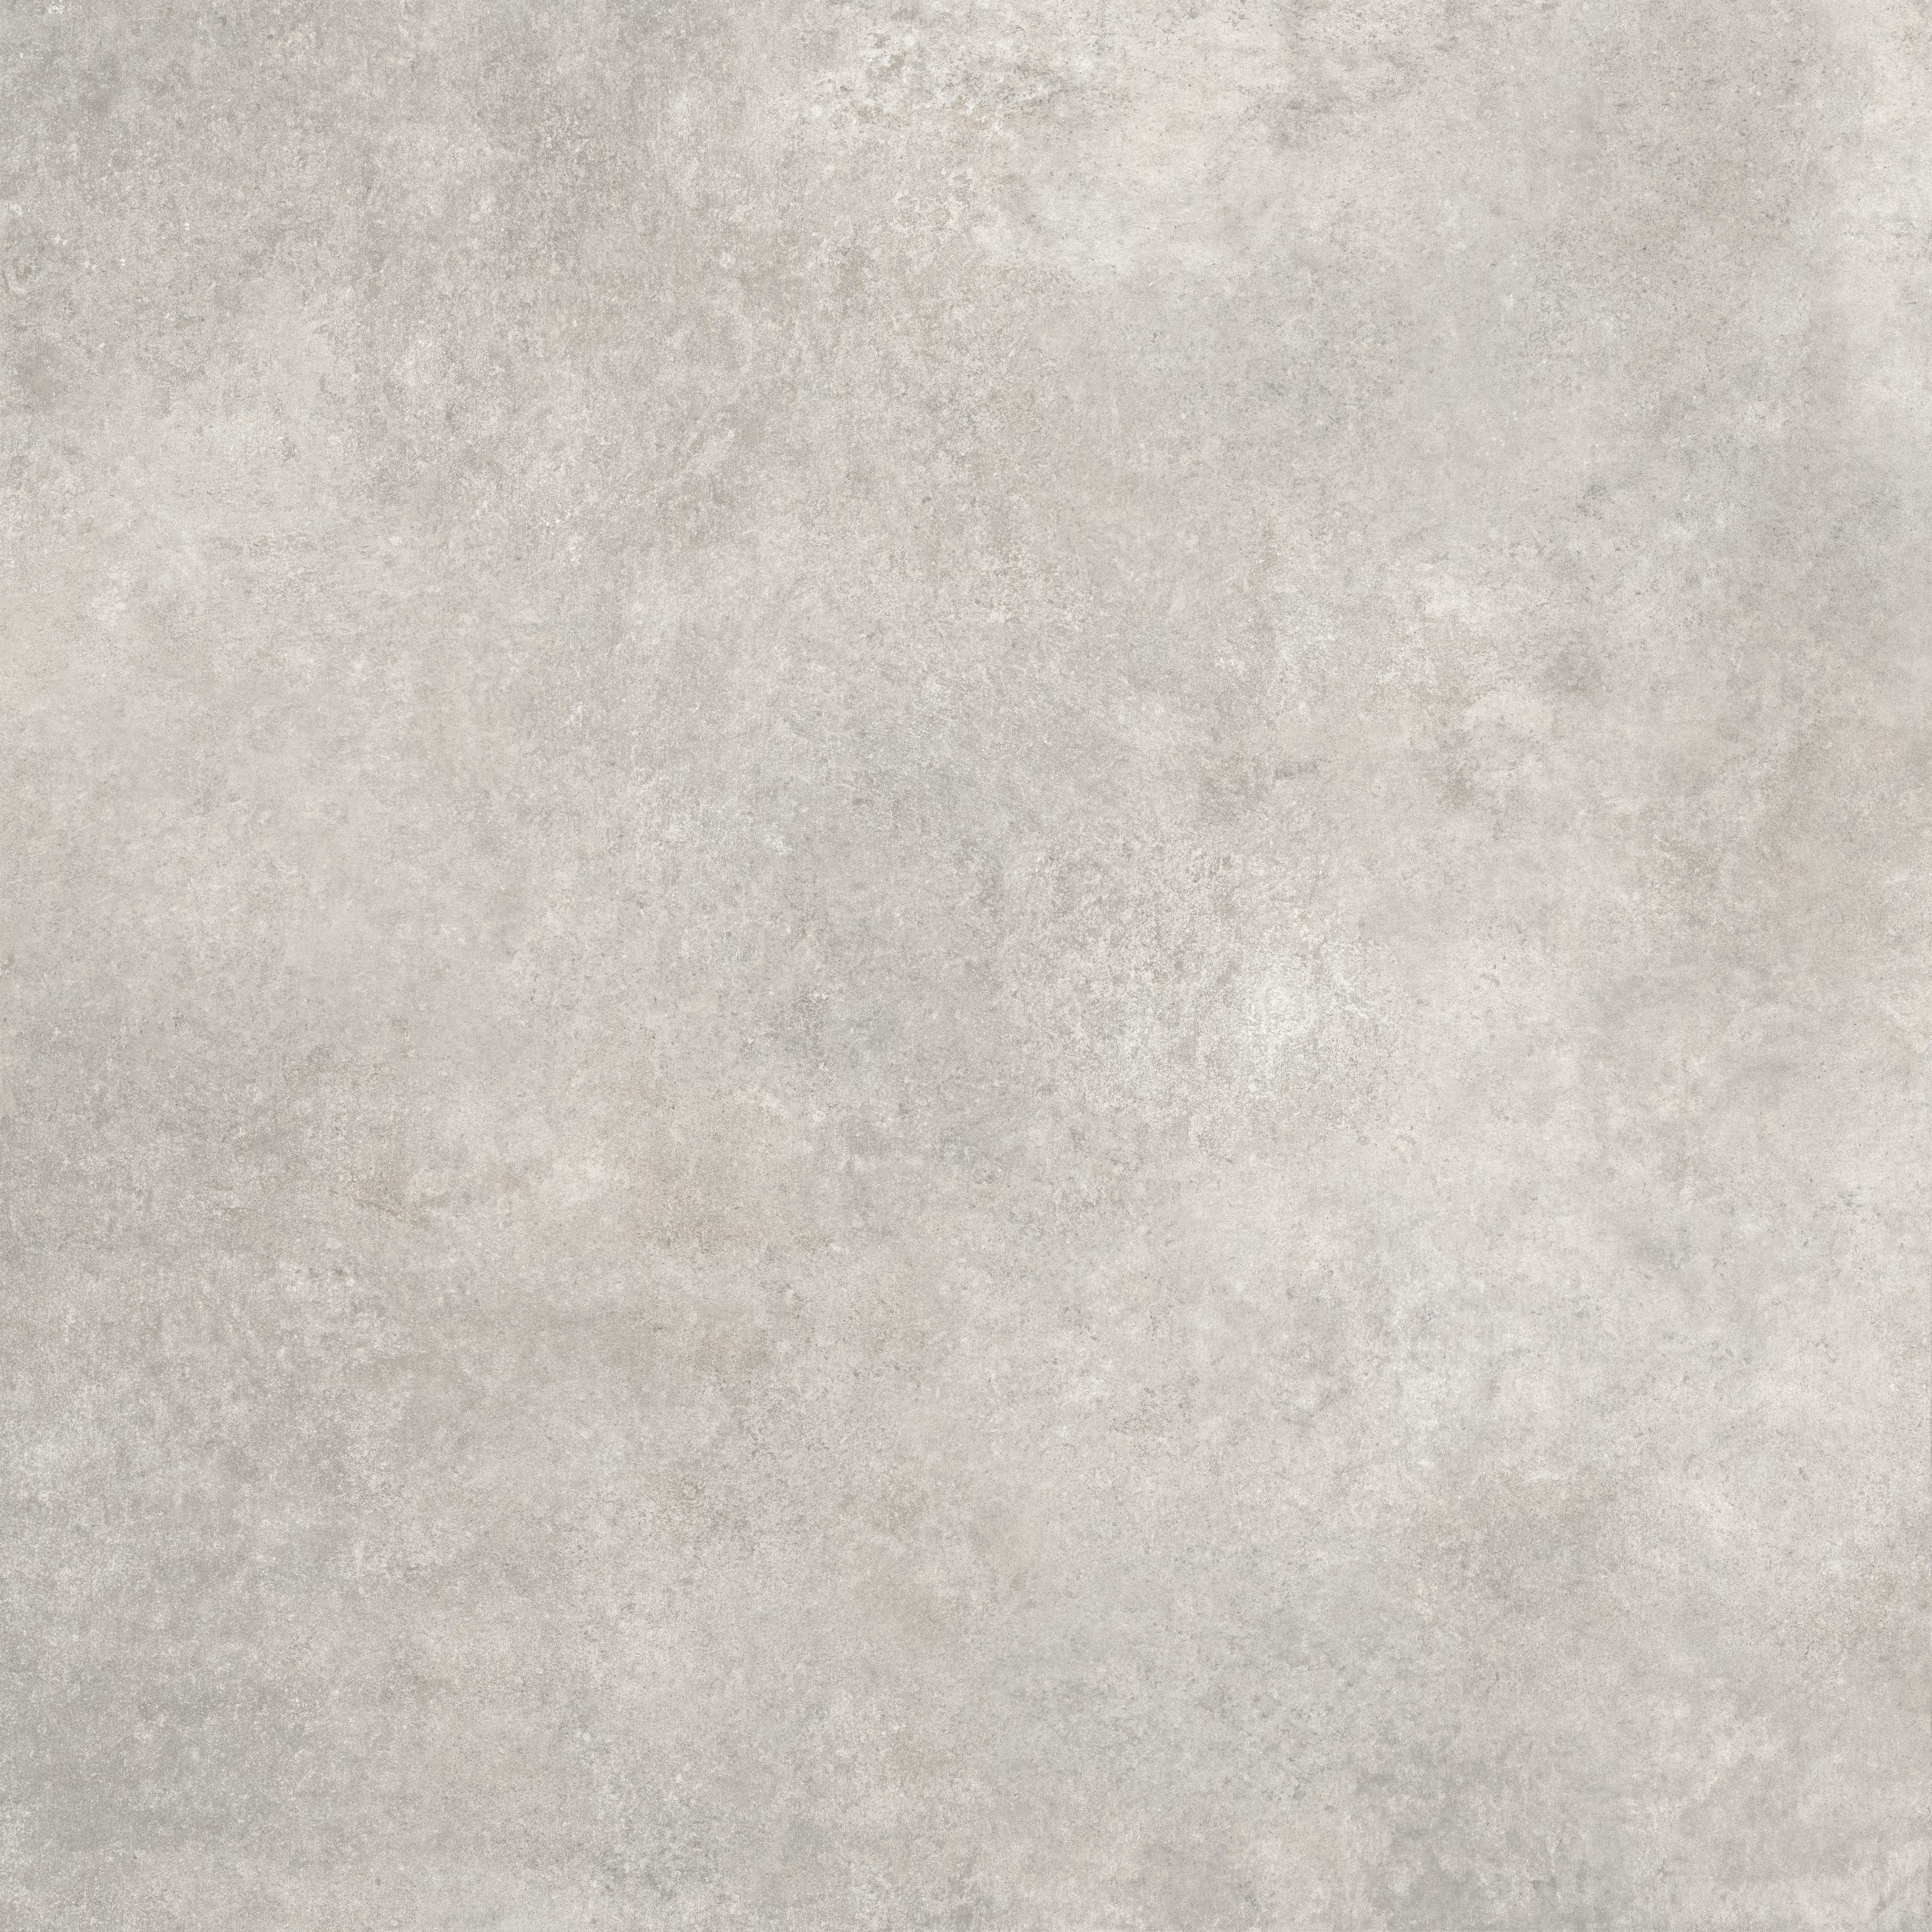 Lifestone Silver 90x90